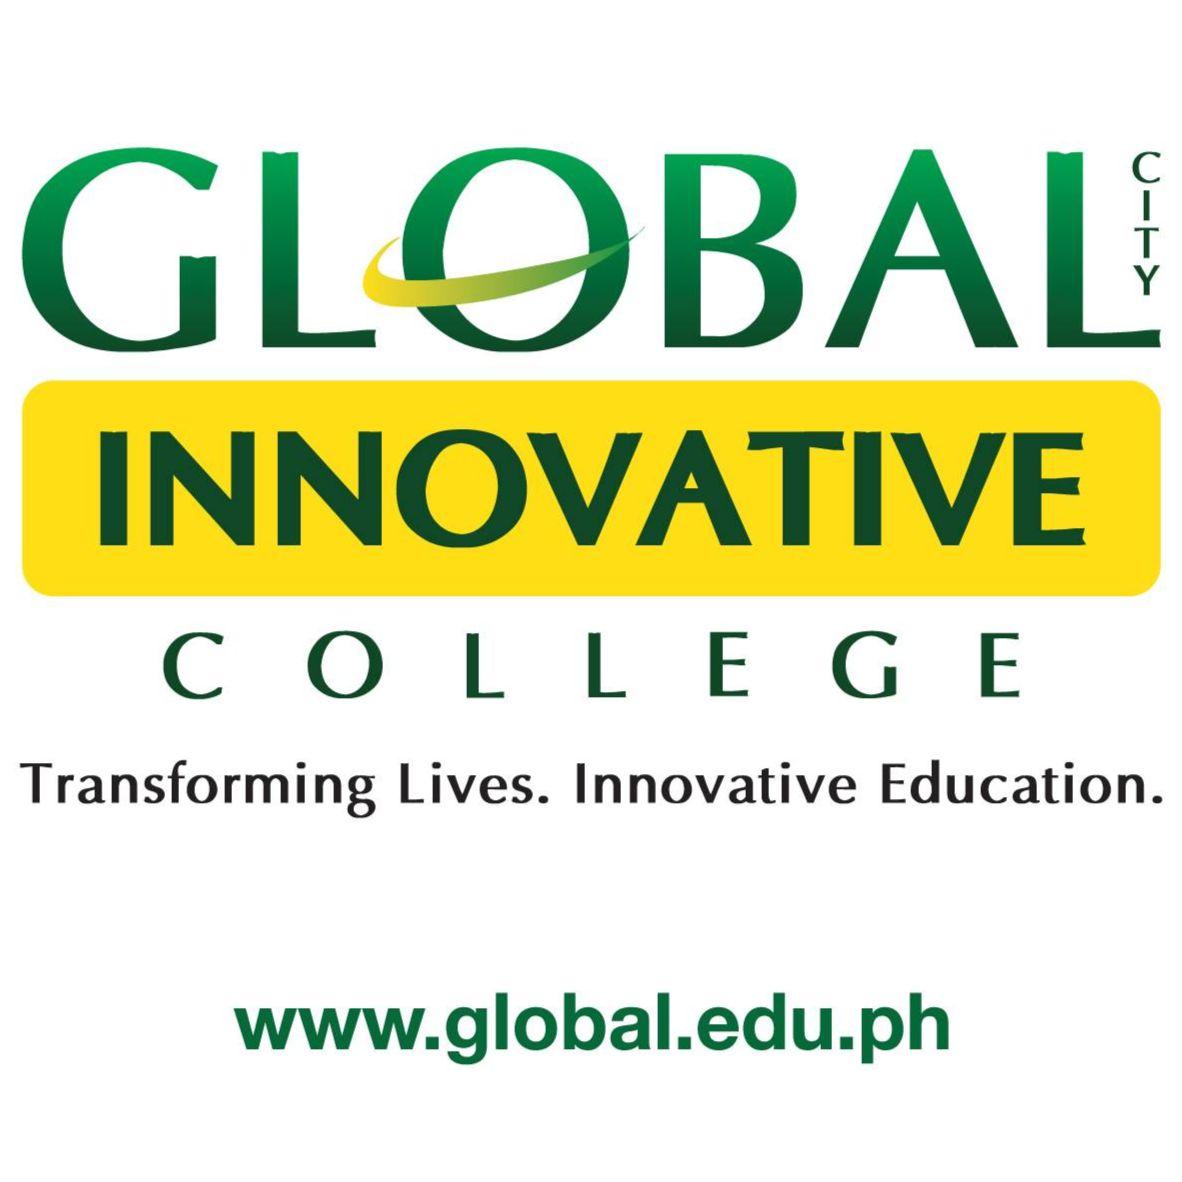 Global City Innovative College